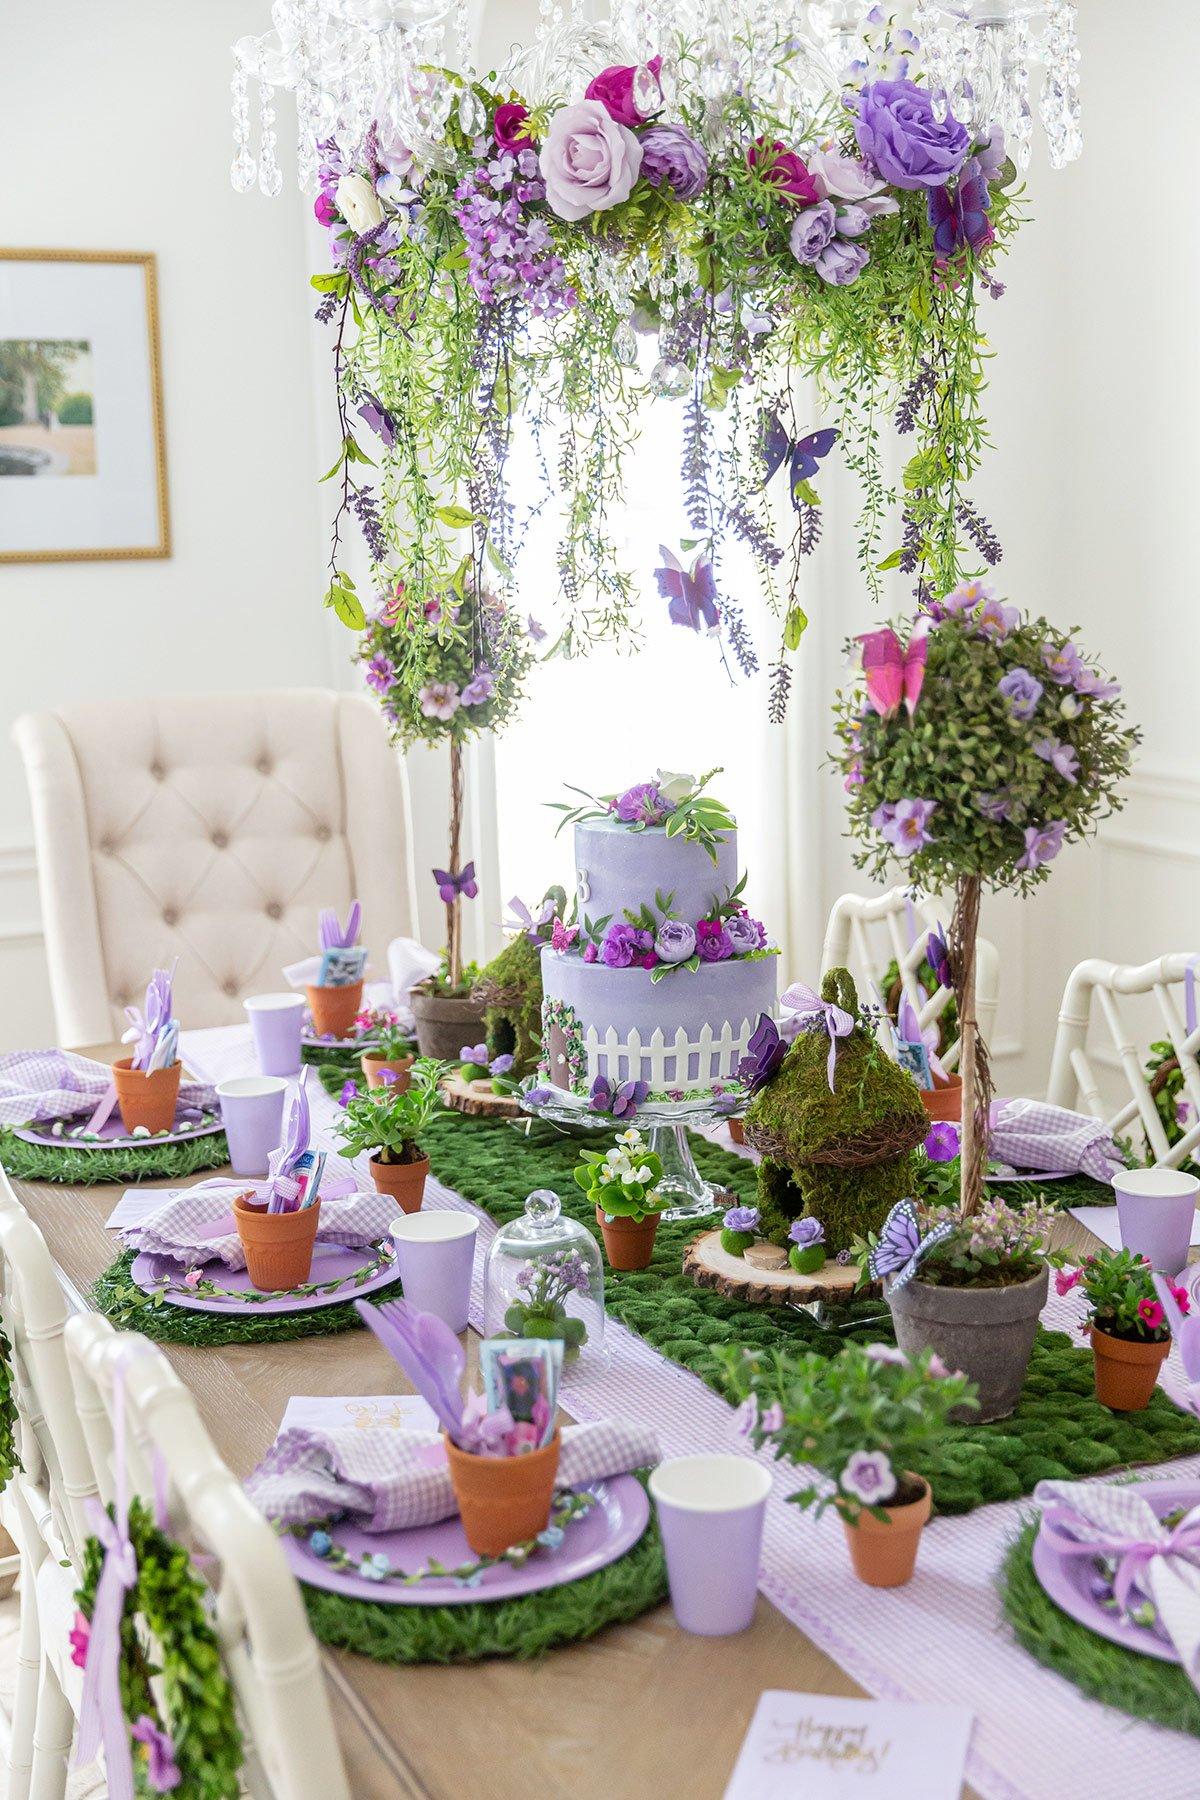 Children's Birthday Party Table